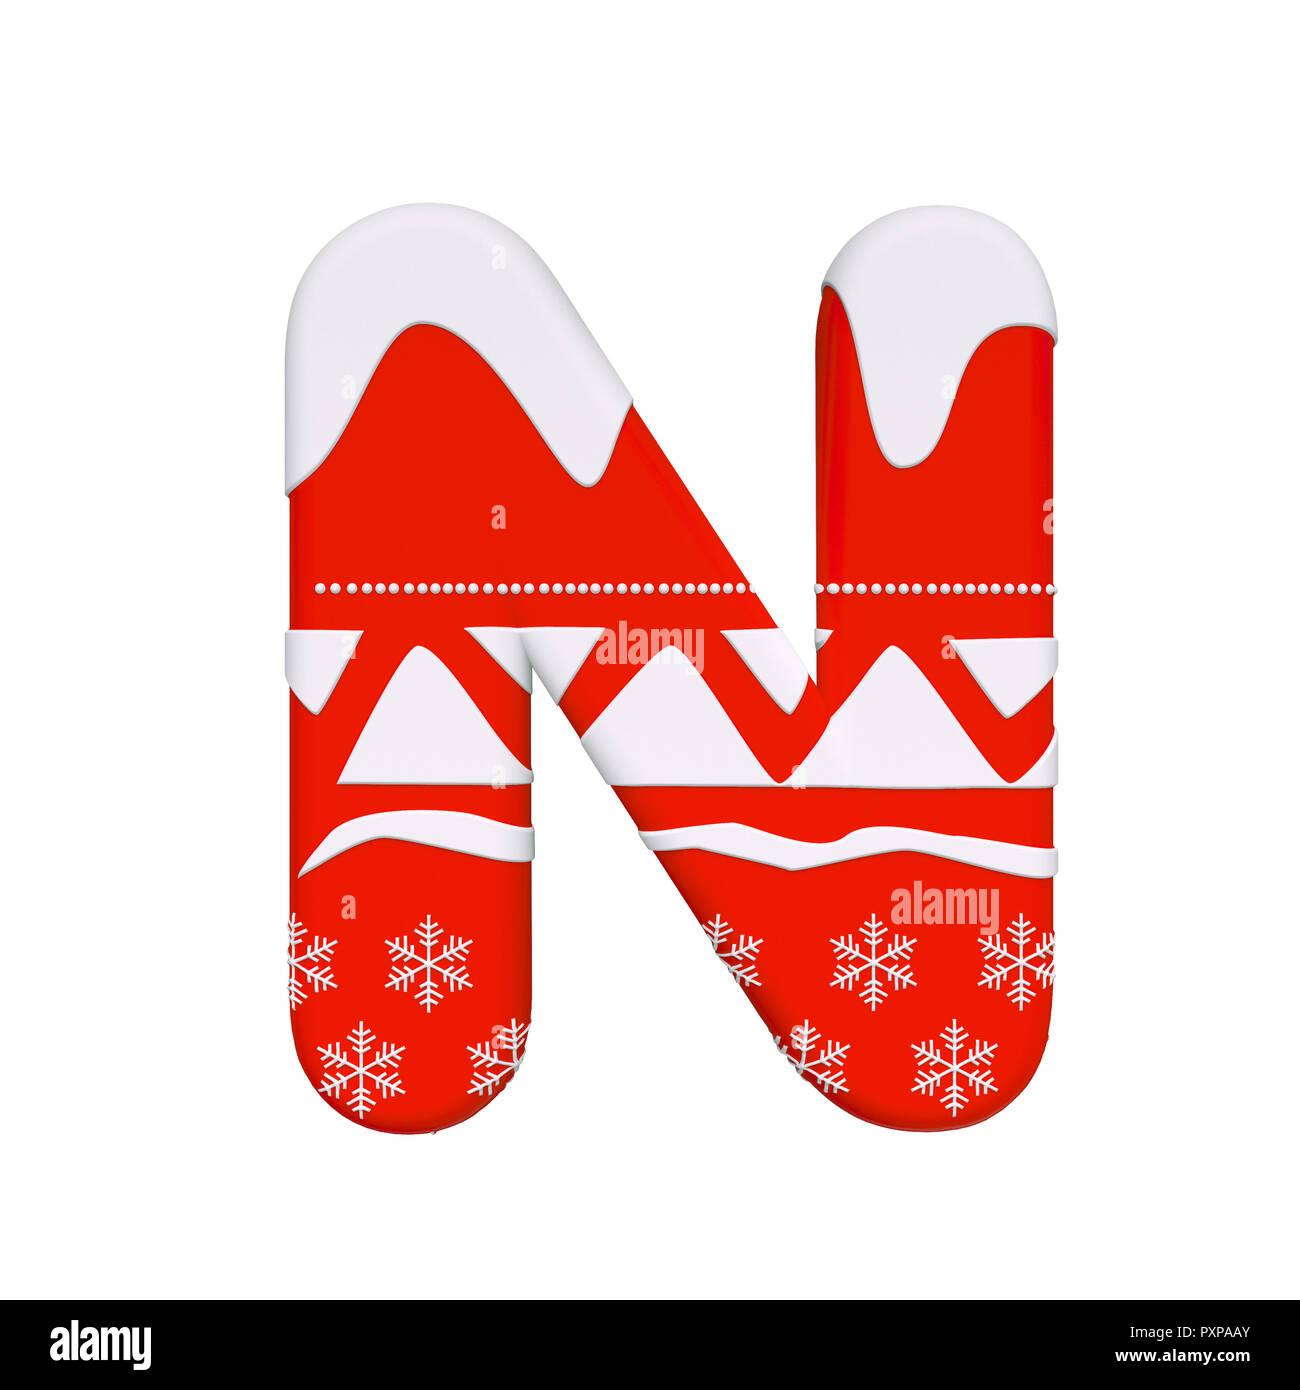 Image De Lettre De Noel.Lettre De Noel N Capital 3d Santa Noel Font Isole Sur Fond